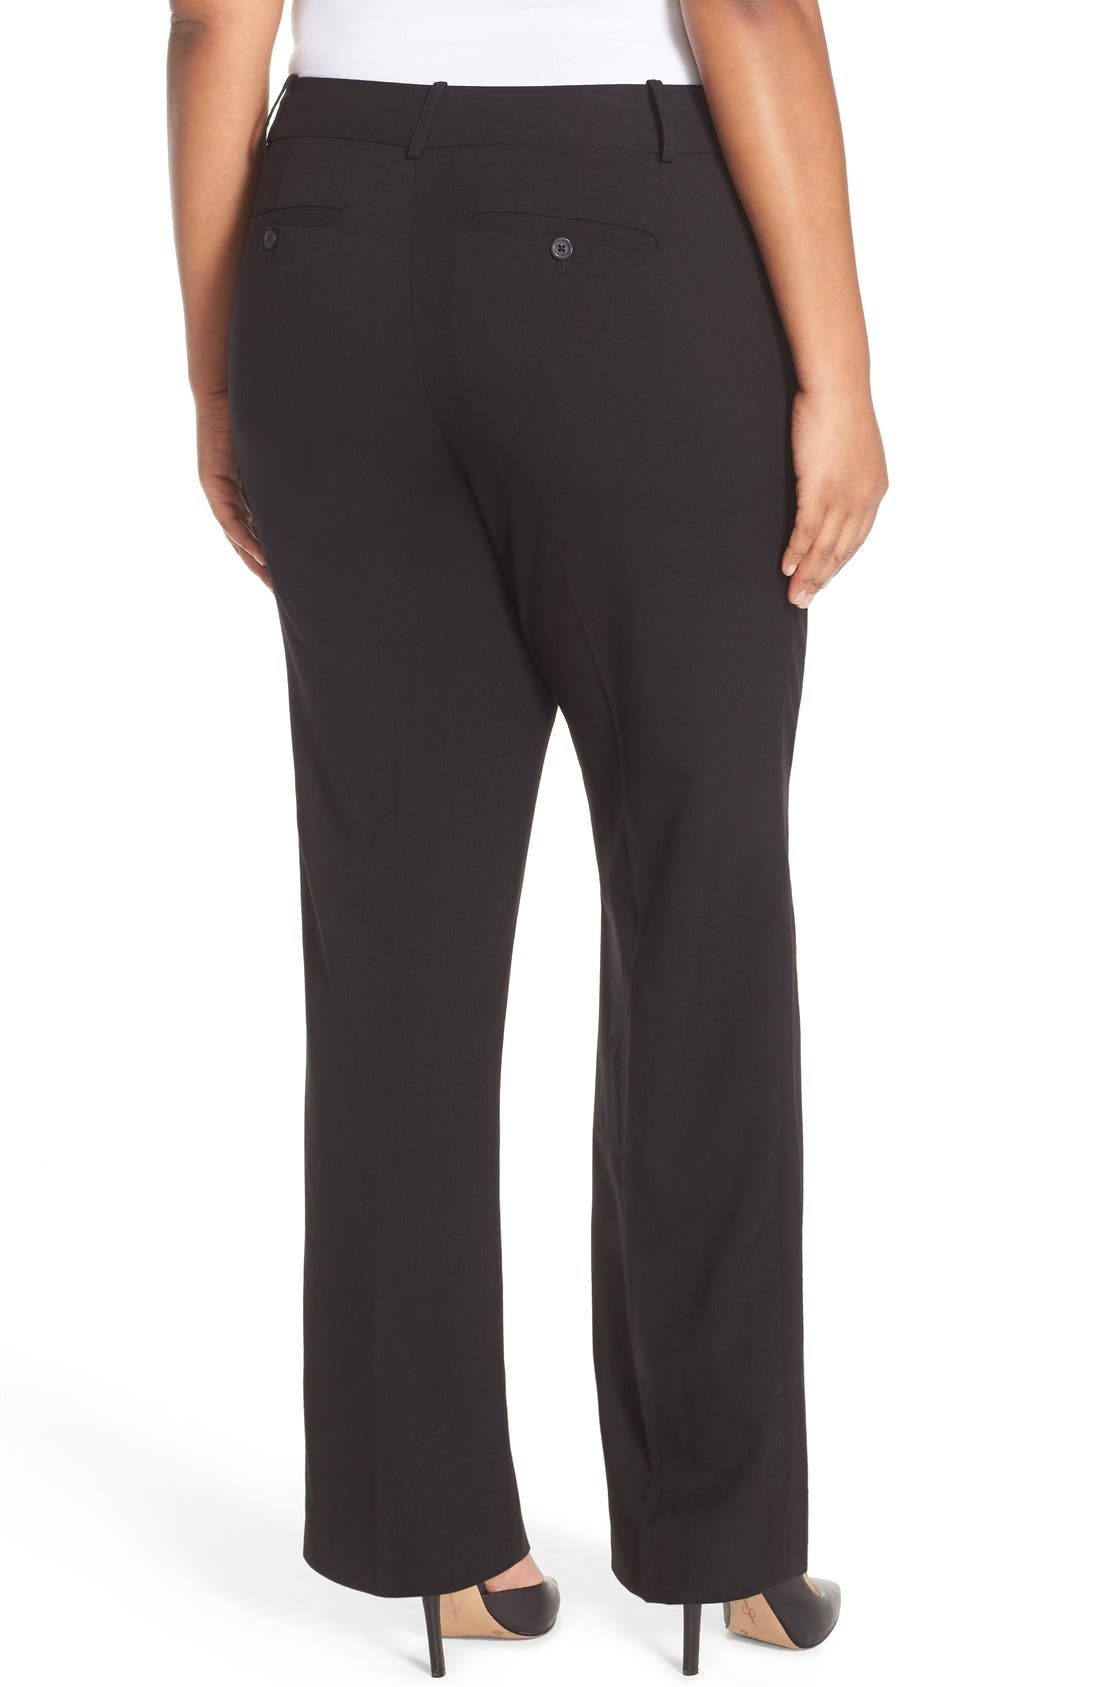 """Gramercy' Two-Pocket Pants,                             Alternate thumbnail 2, color,                             001"